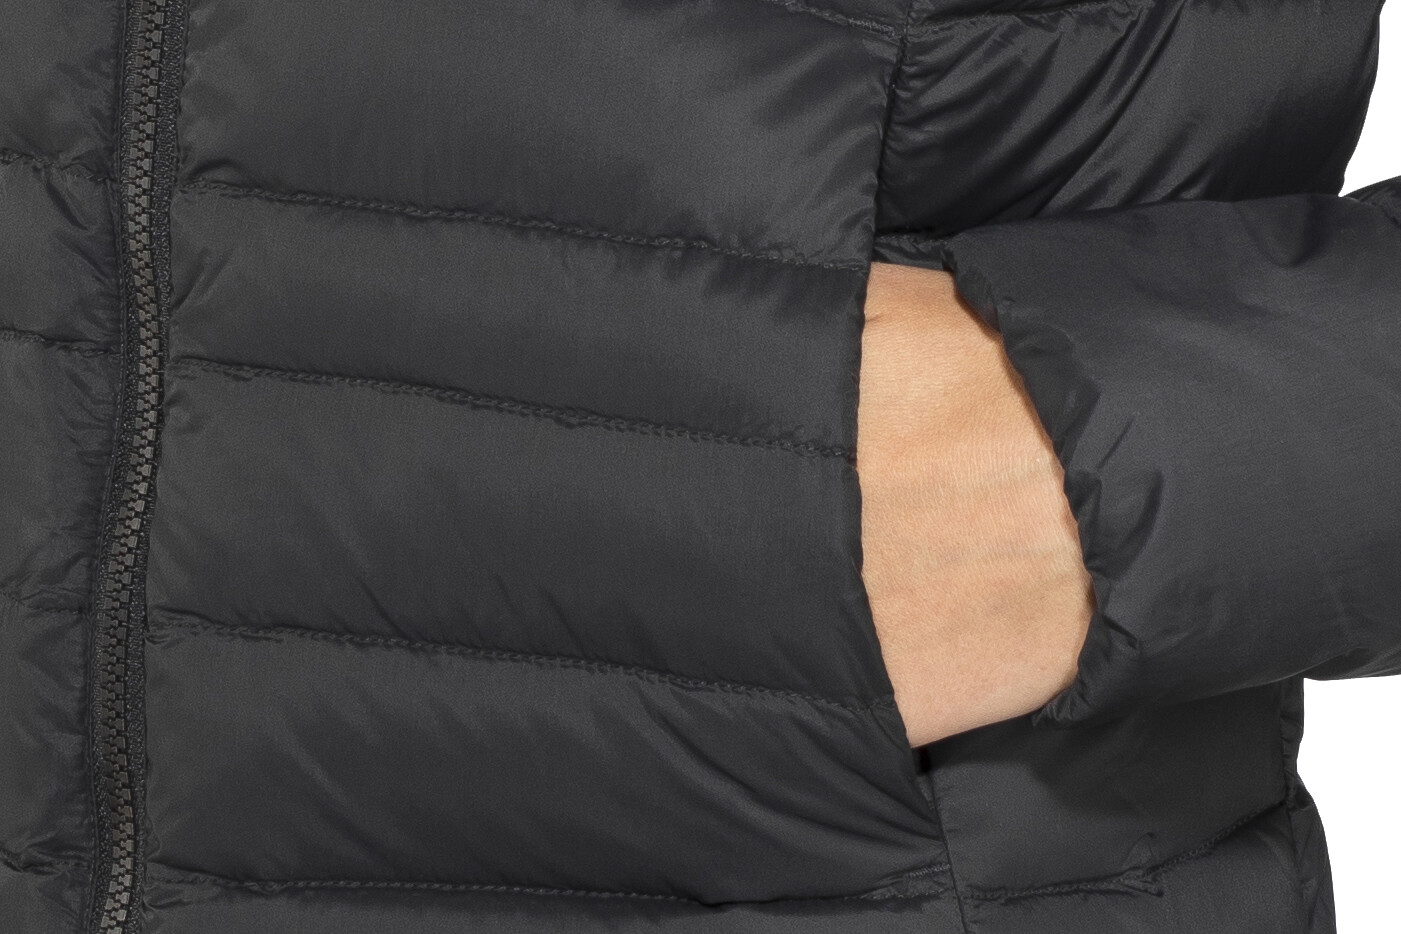 Fjällräven Keb Touring Manteau en duvet Femme, black sur